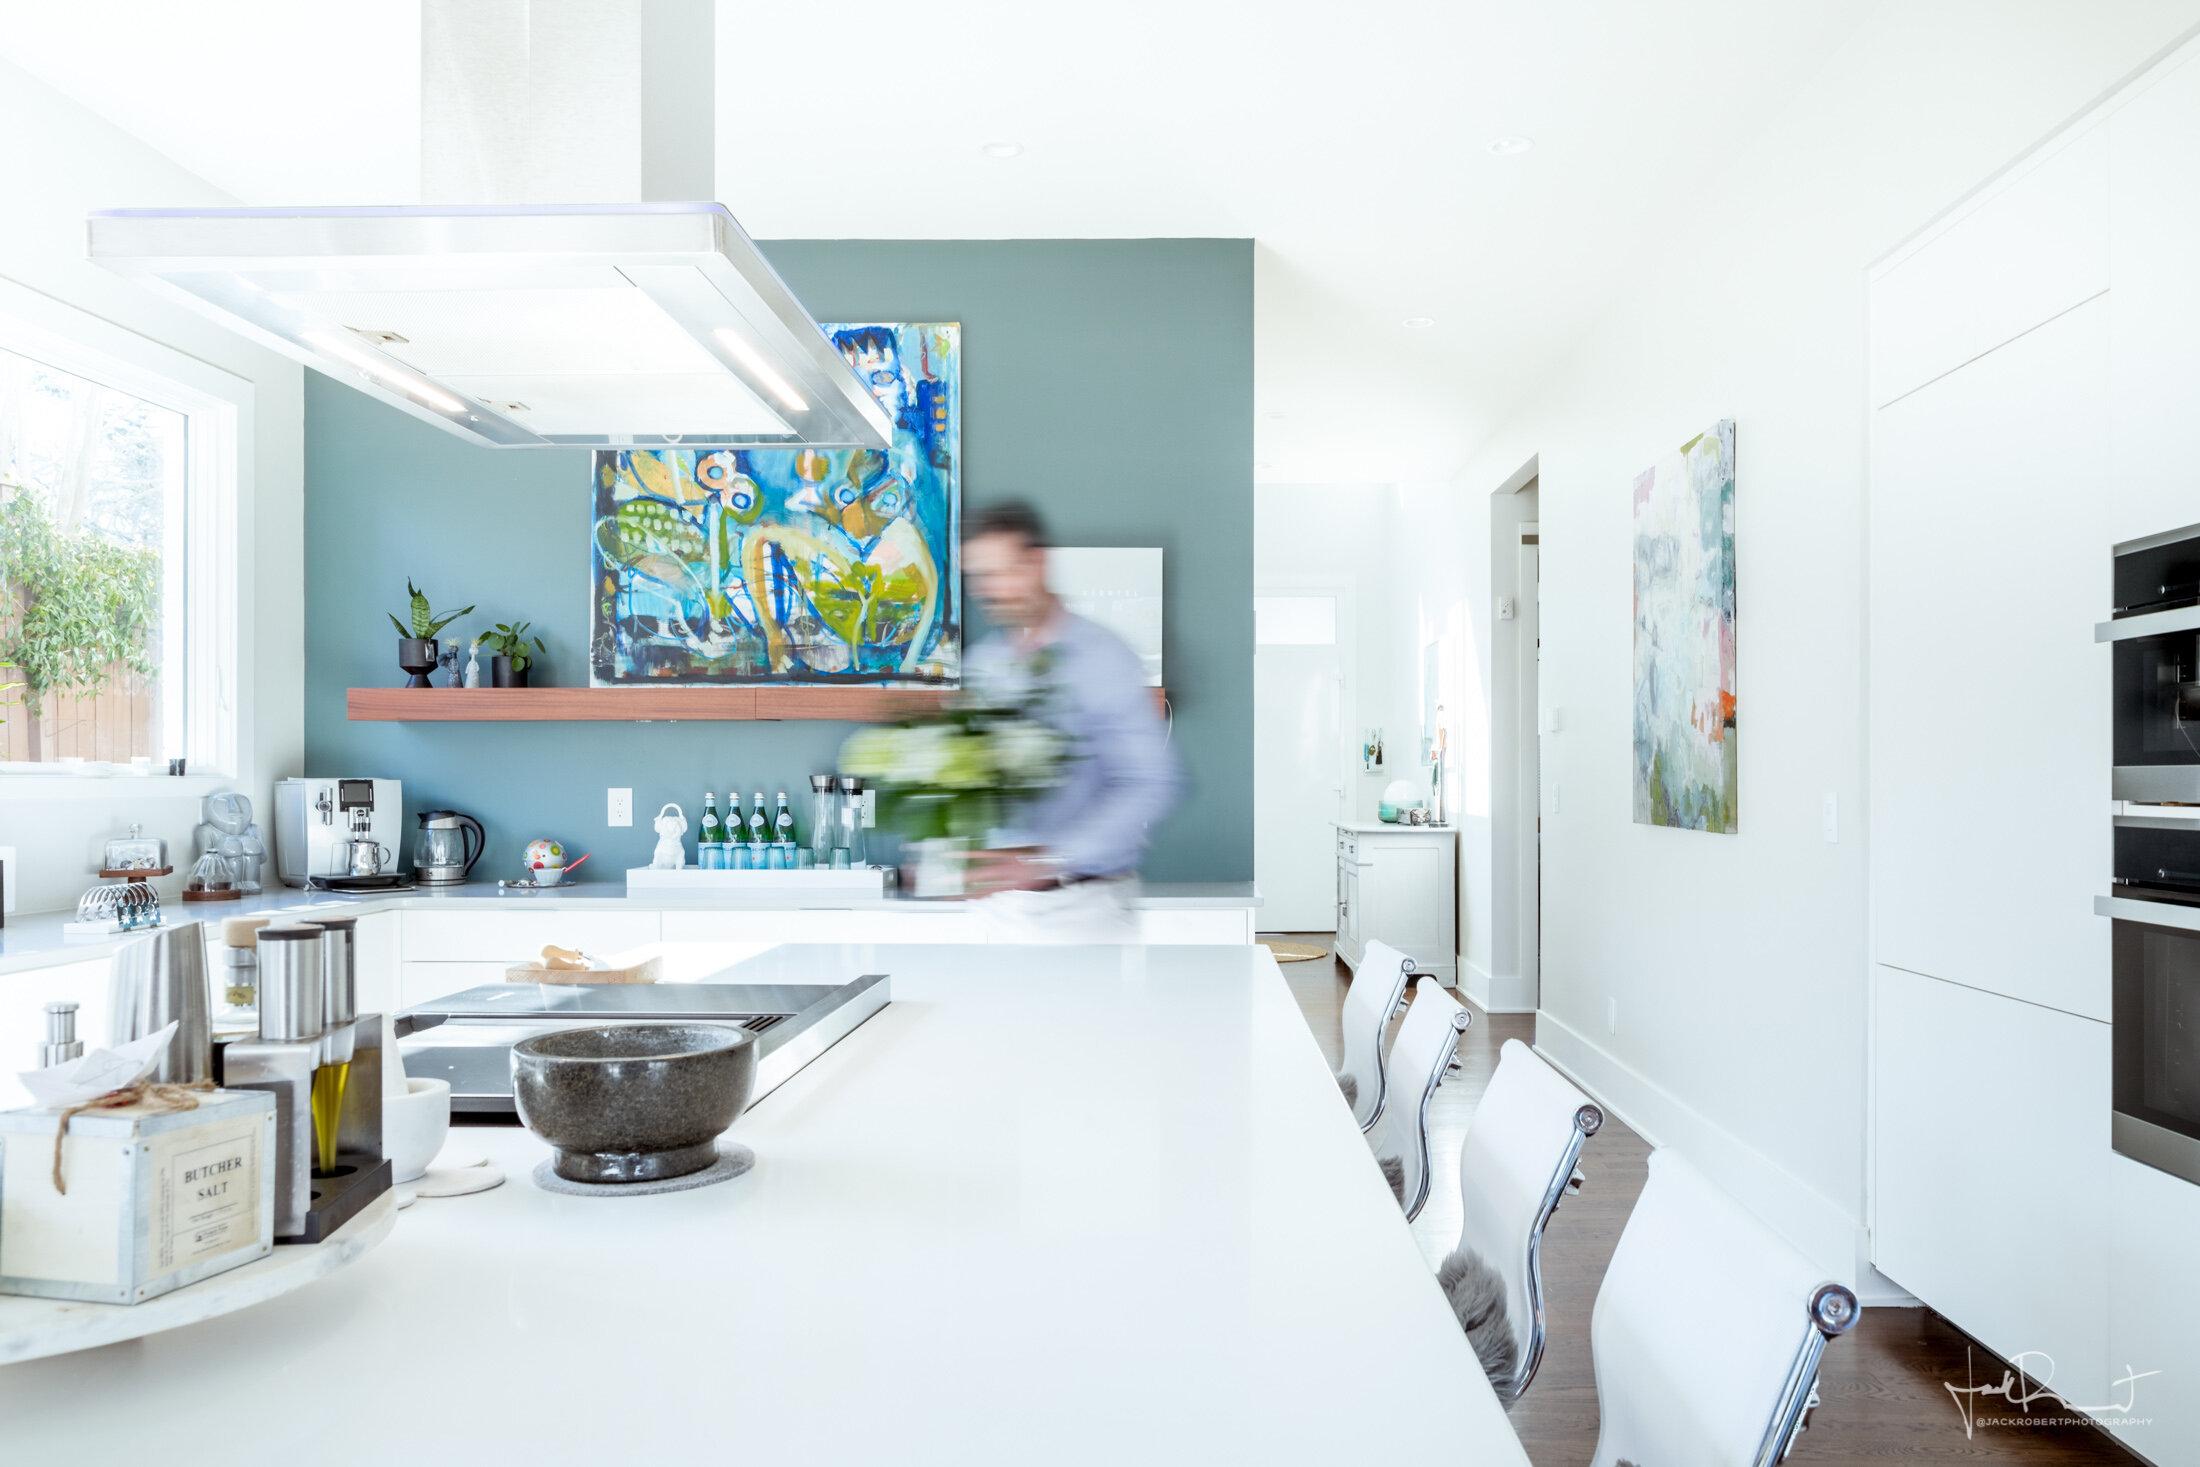 2020-02-28 Forest Kitchen Design - Jack Robert Photography (12 of 52).jpg